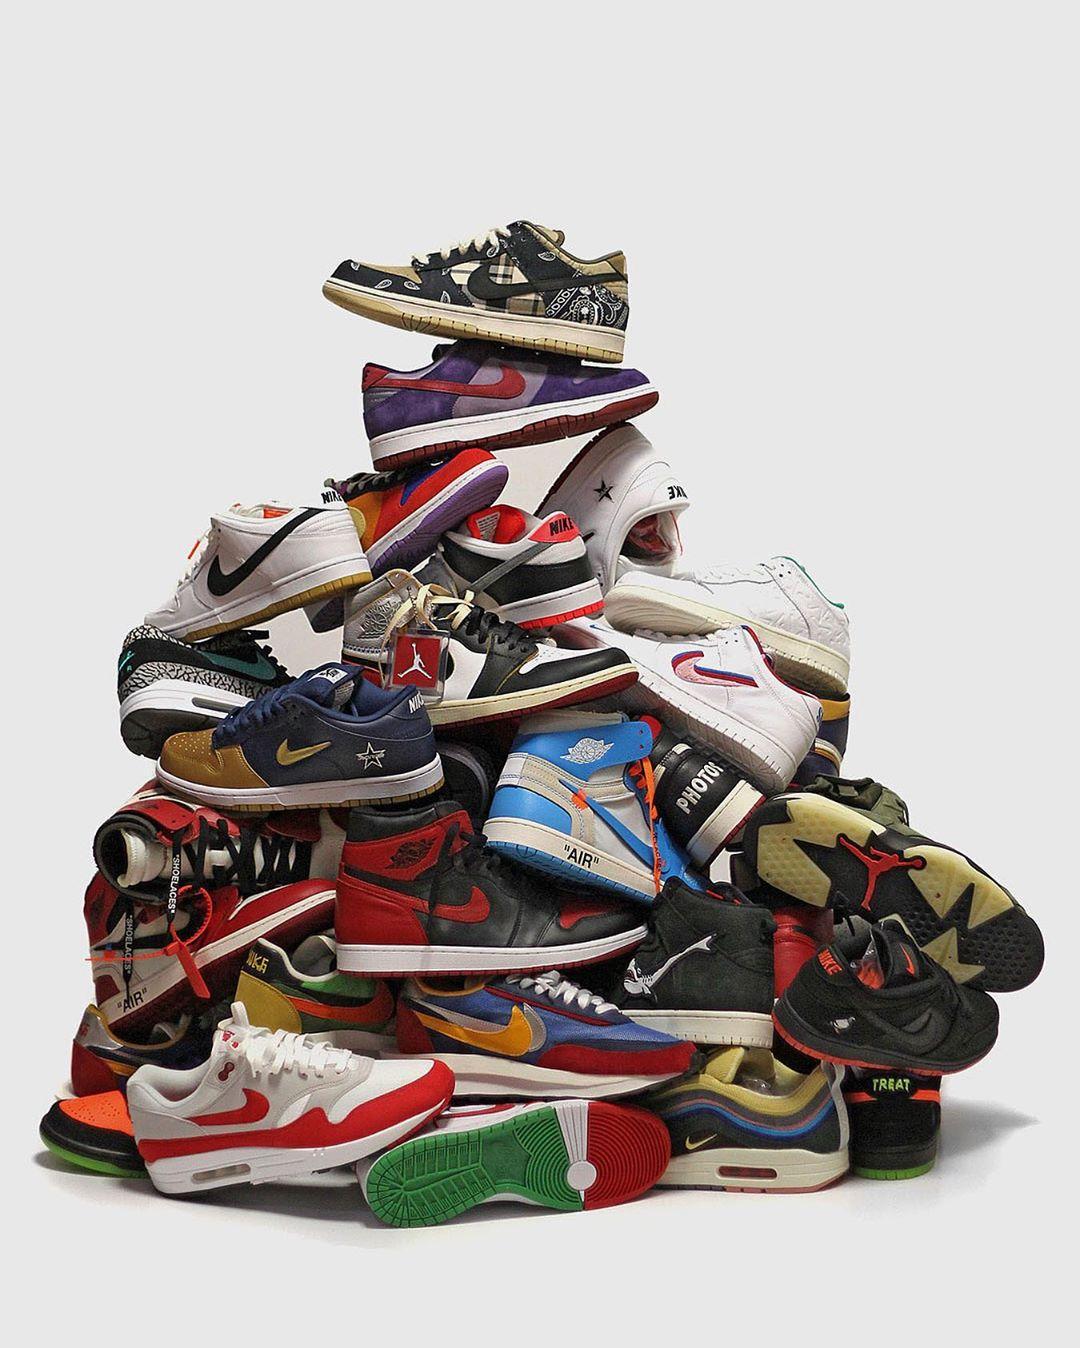 Dunk SB,Nike,发售,travis scott  10 双身价起飞的 Dunk SB 大盘点!暴涨 8000 的 TS 联名仅排第二!